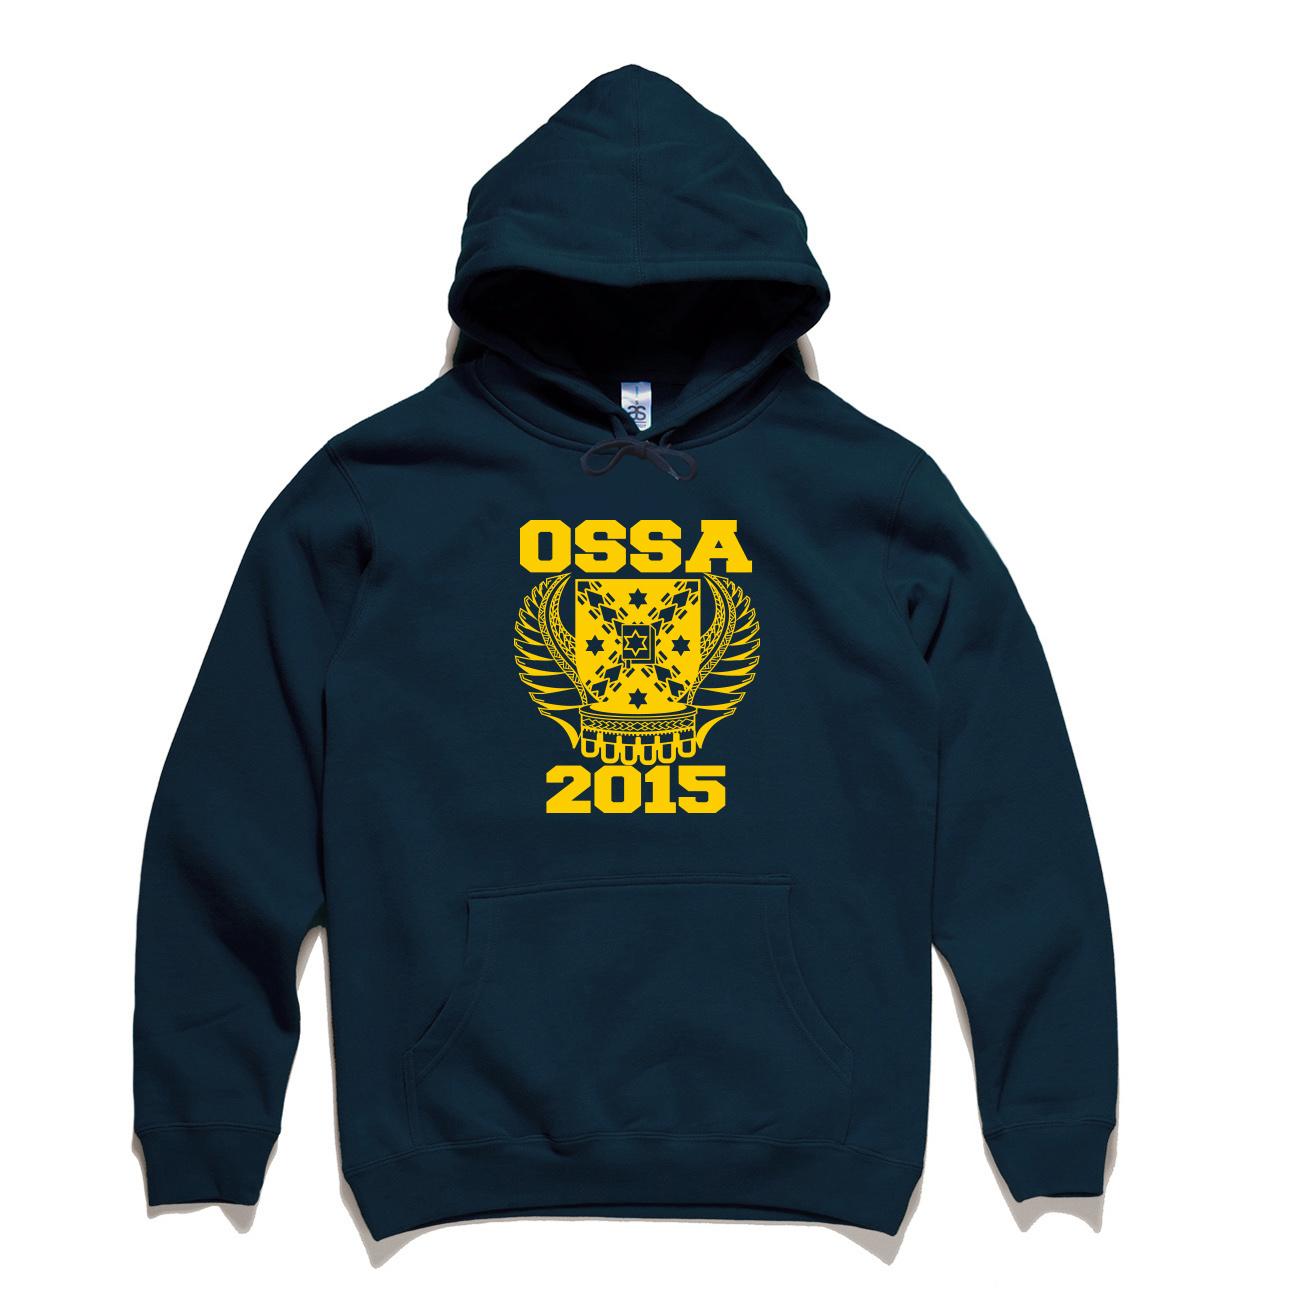 OSSA-hoodie-navy-front.jpg